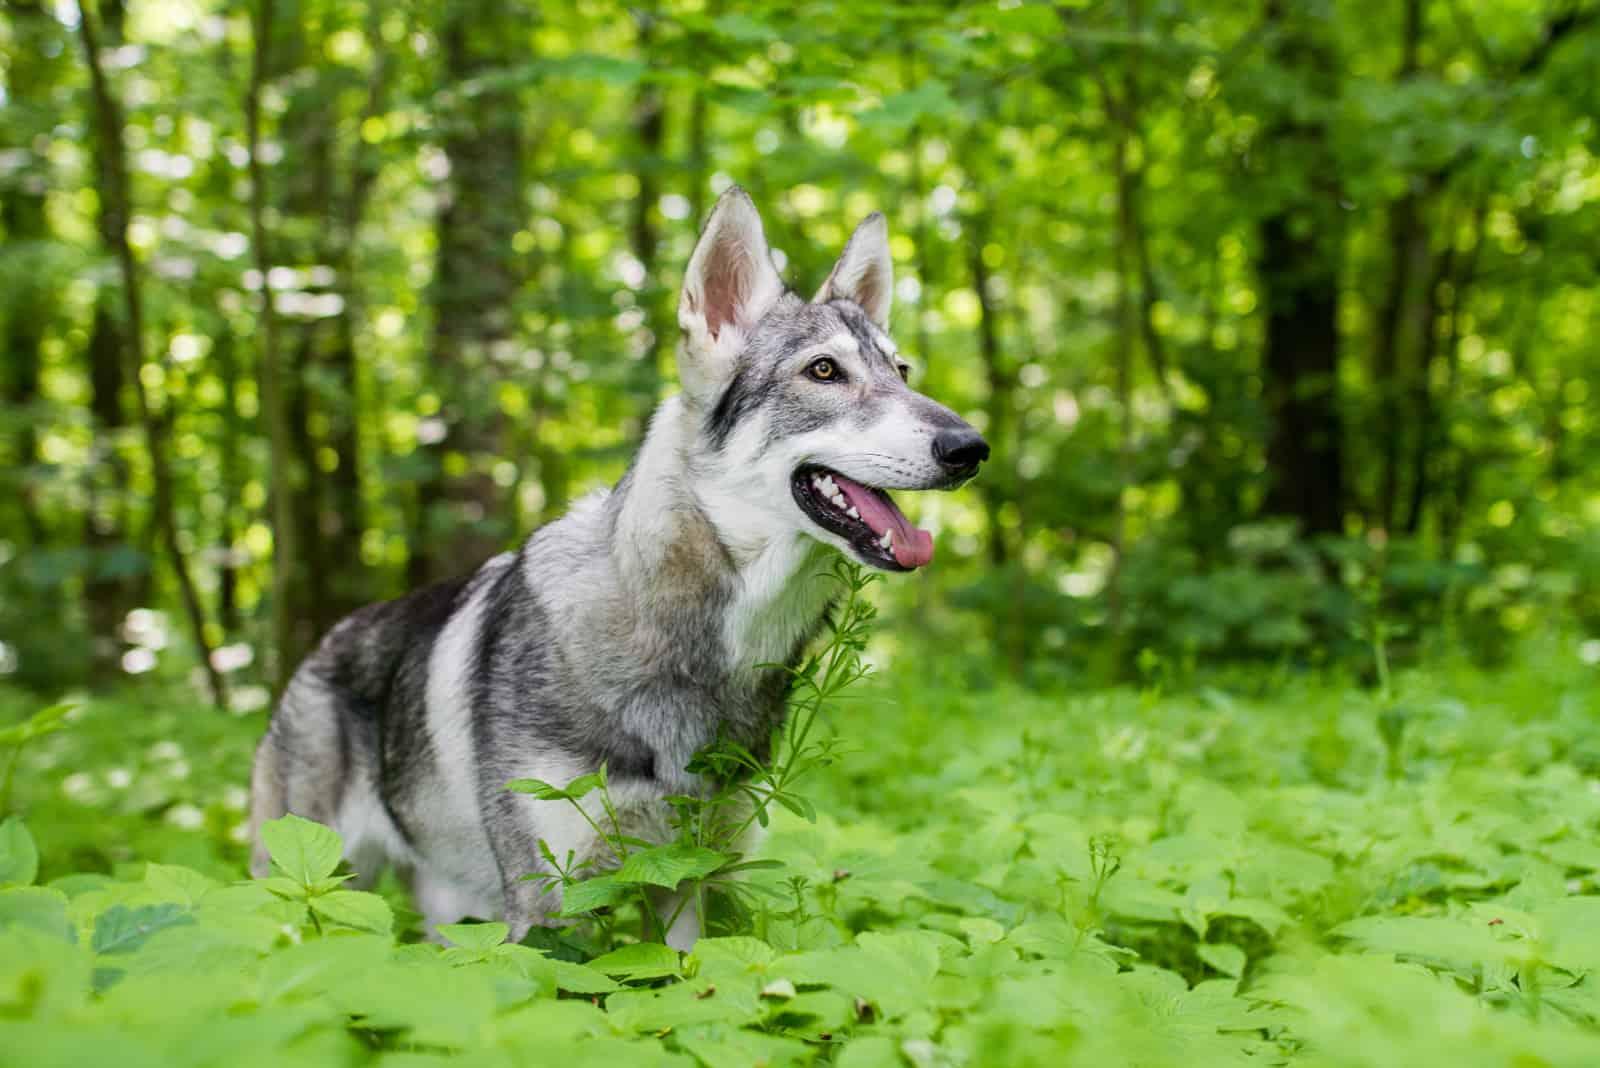 Northern inuit dog walks through the woods